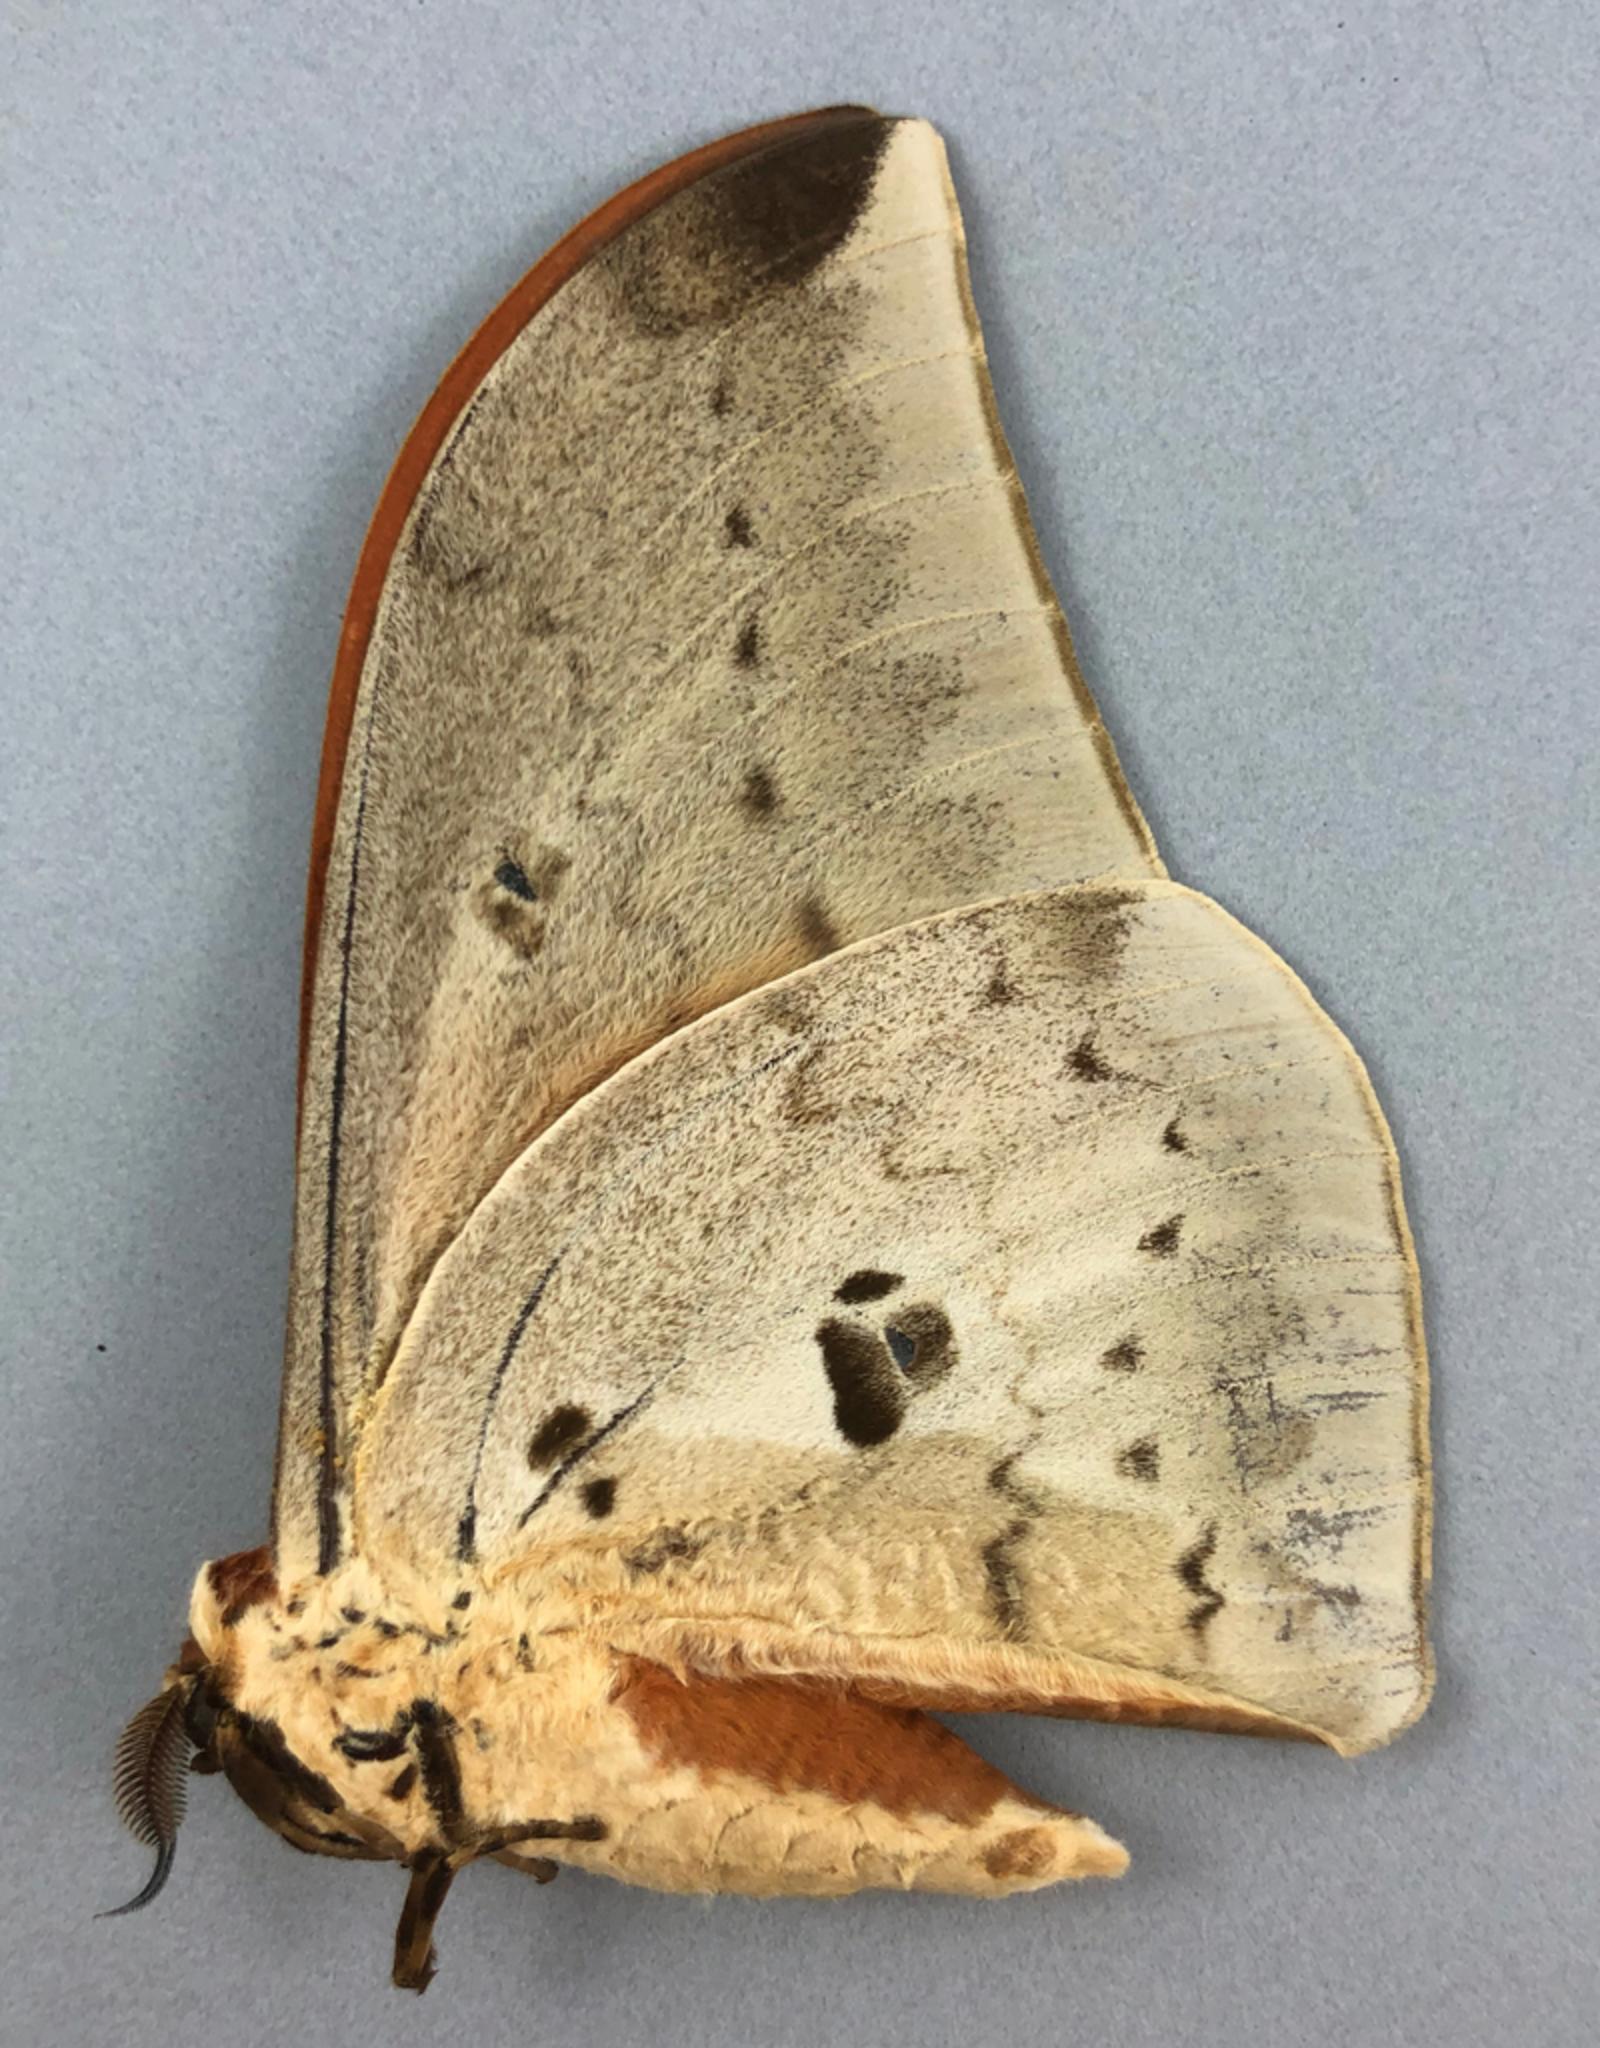 Pseudobunaea epithyrena M A1/A1- Obout, Cameroon